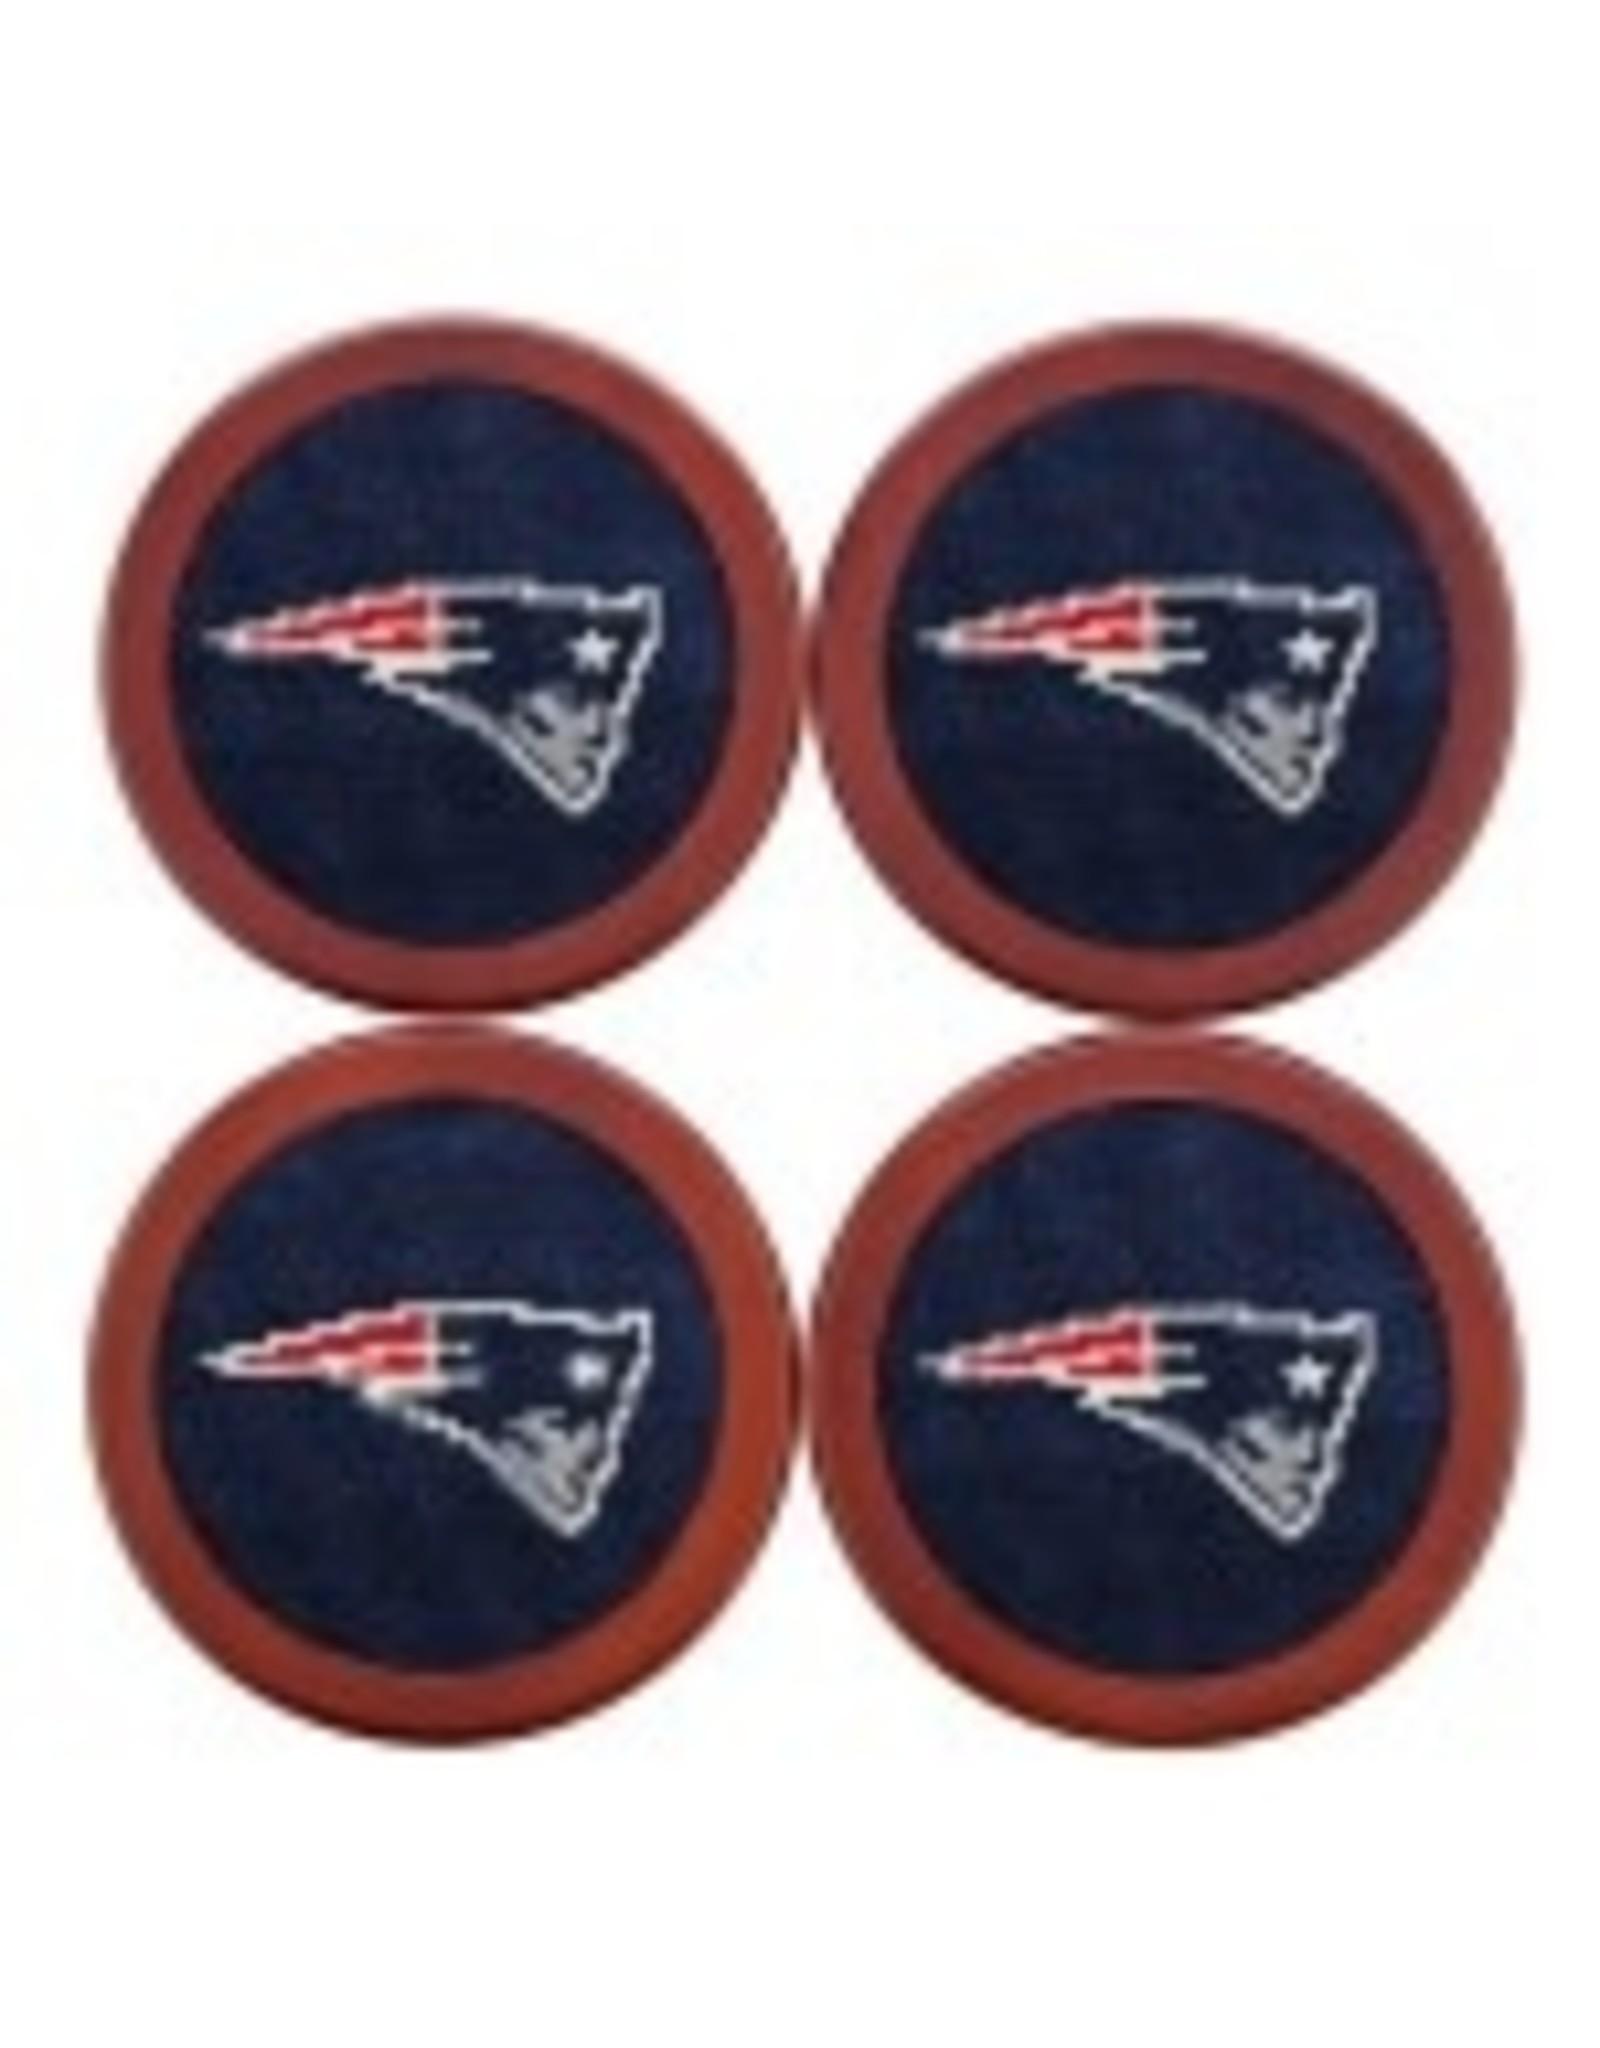 Smathers & Branson Patriots Coasters